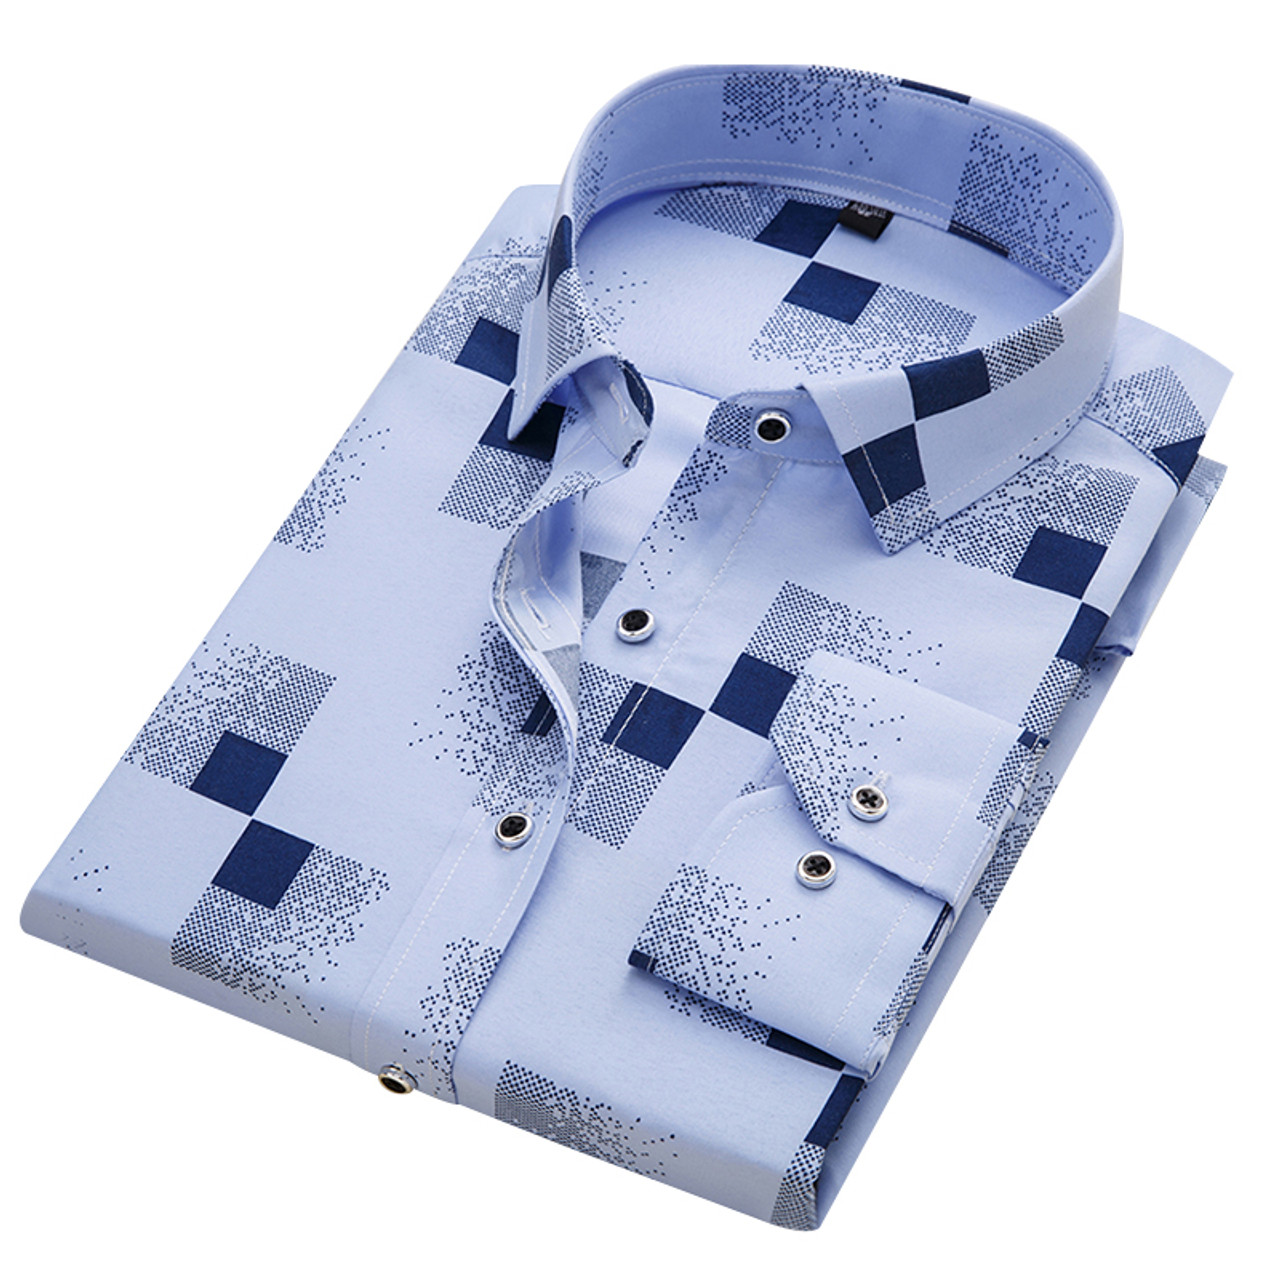 0b69cb3623ab9 DAVYDAISY 2018 New Arrival 100% Polyester Men's Shirt Fashion Men Print  Long Sleeved Shirt Male Slim Fit Brand Clothing DS217